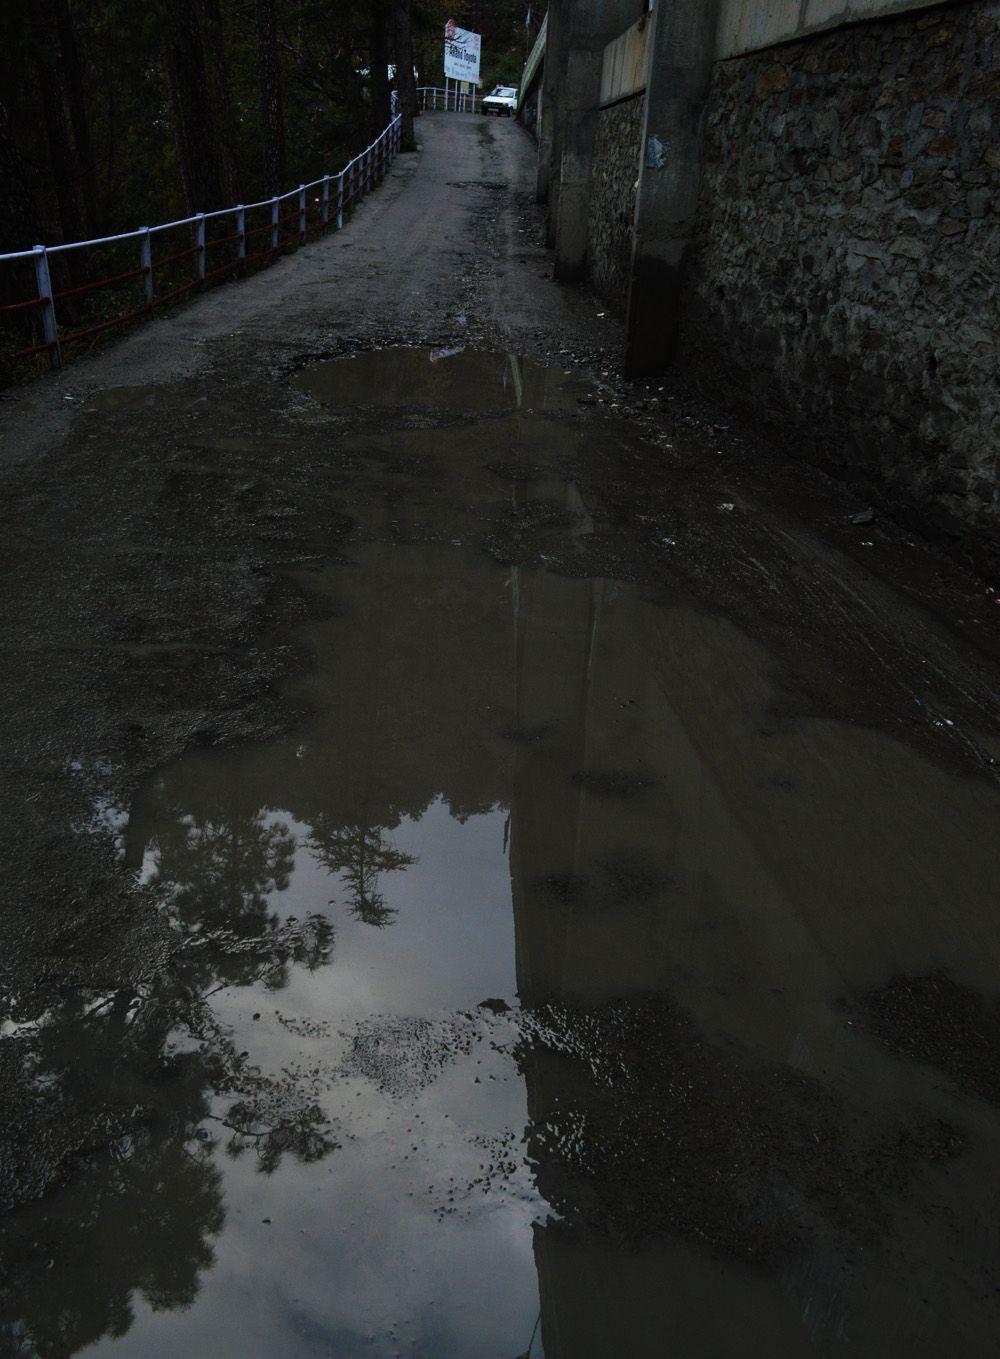 roads-in-shimla-are-poor